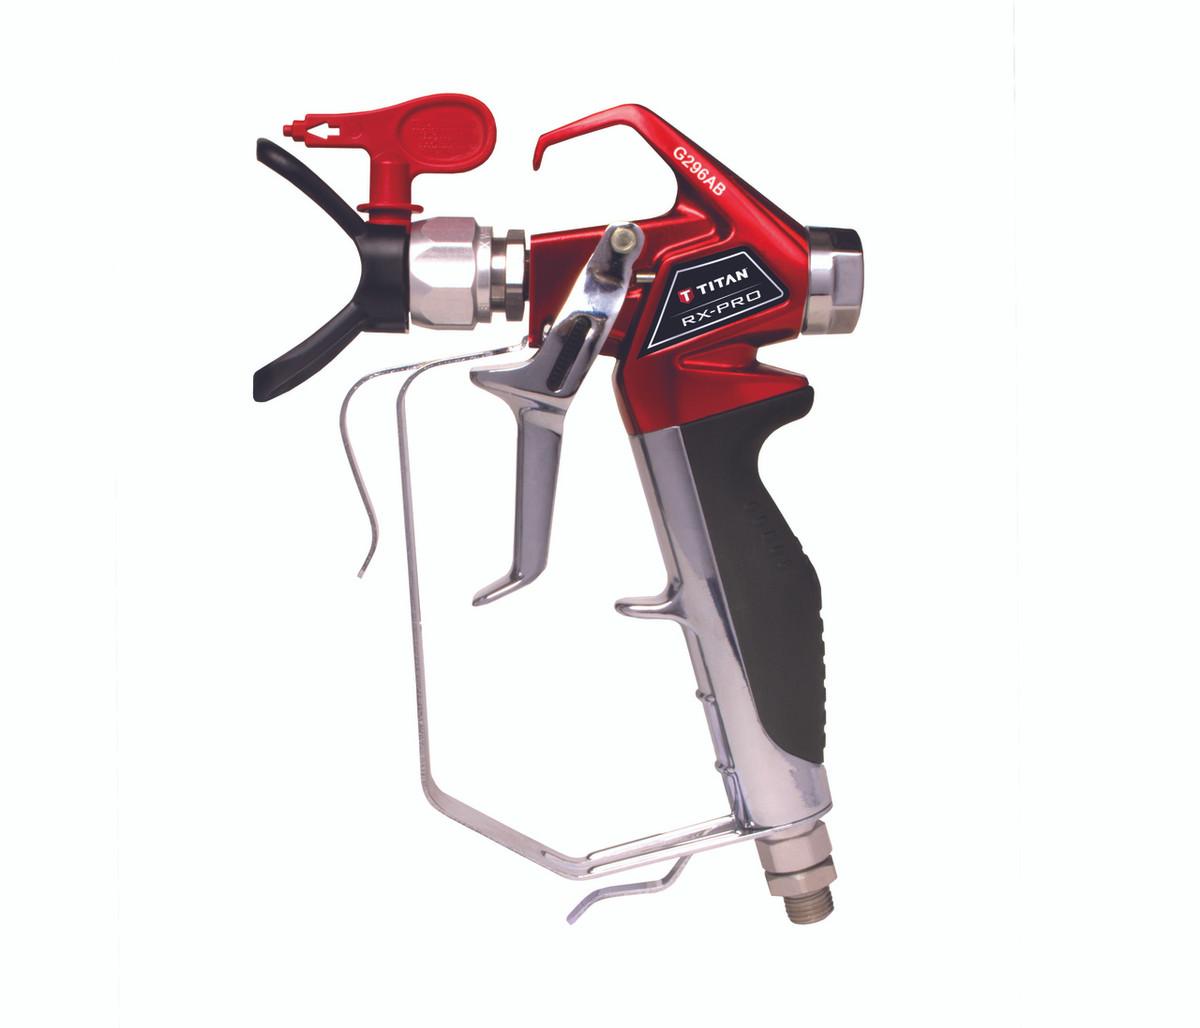 Titan RX-PRO Red Series Airless Spray Gun 0538020 / 538020 - OEM